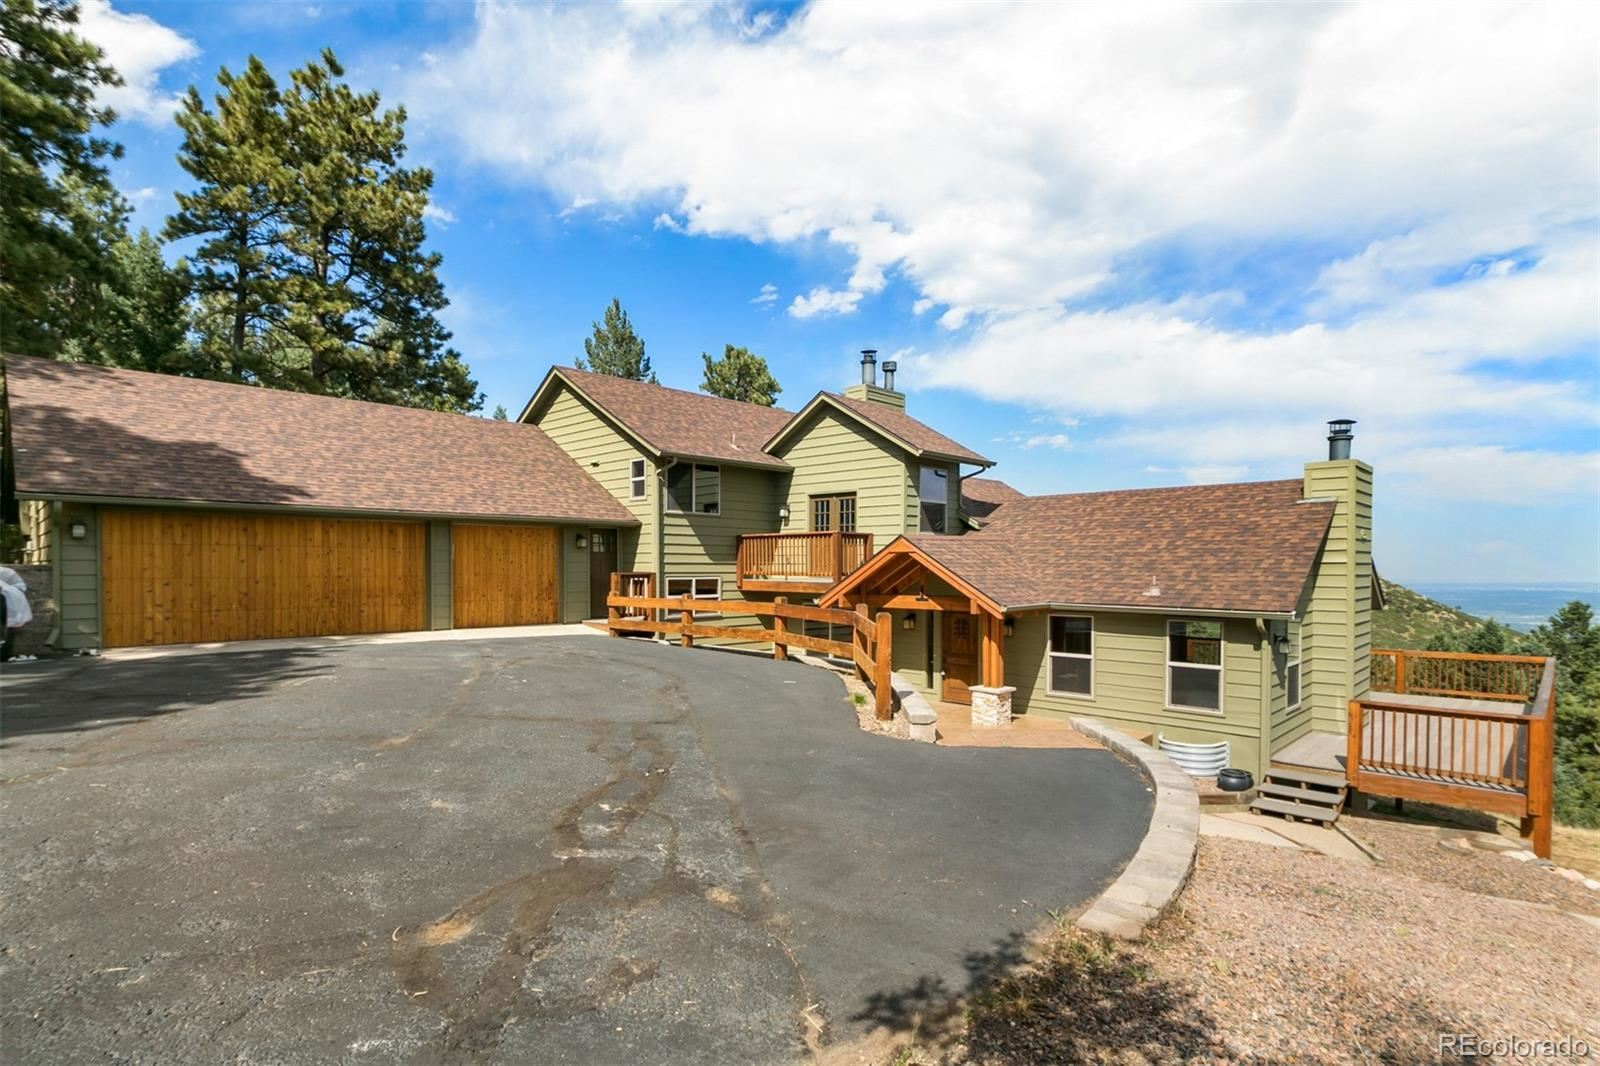 65 W Ranch Trail, Morrison, CO 80465 - MLS#: 4544489